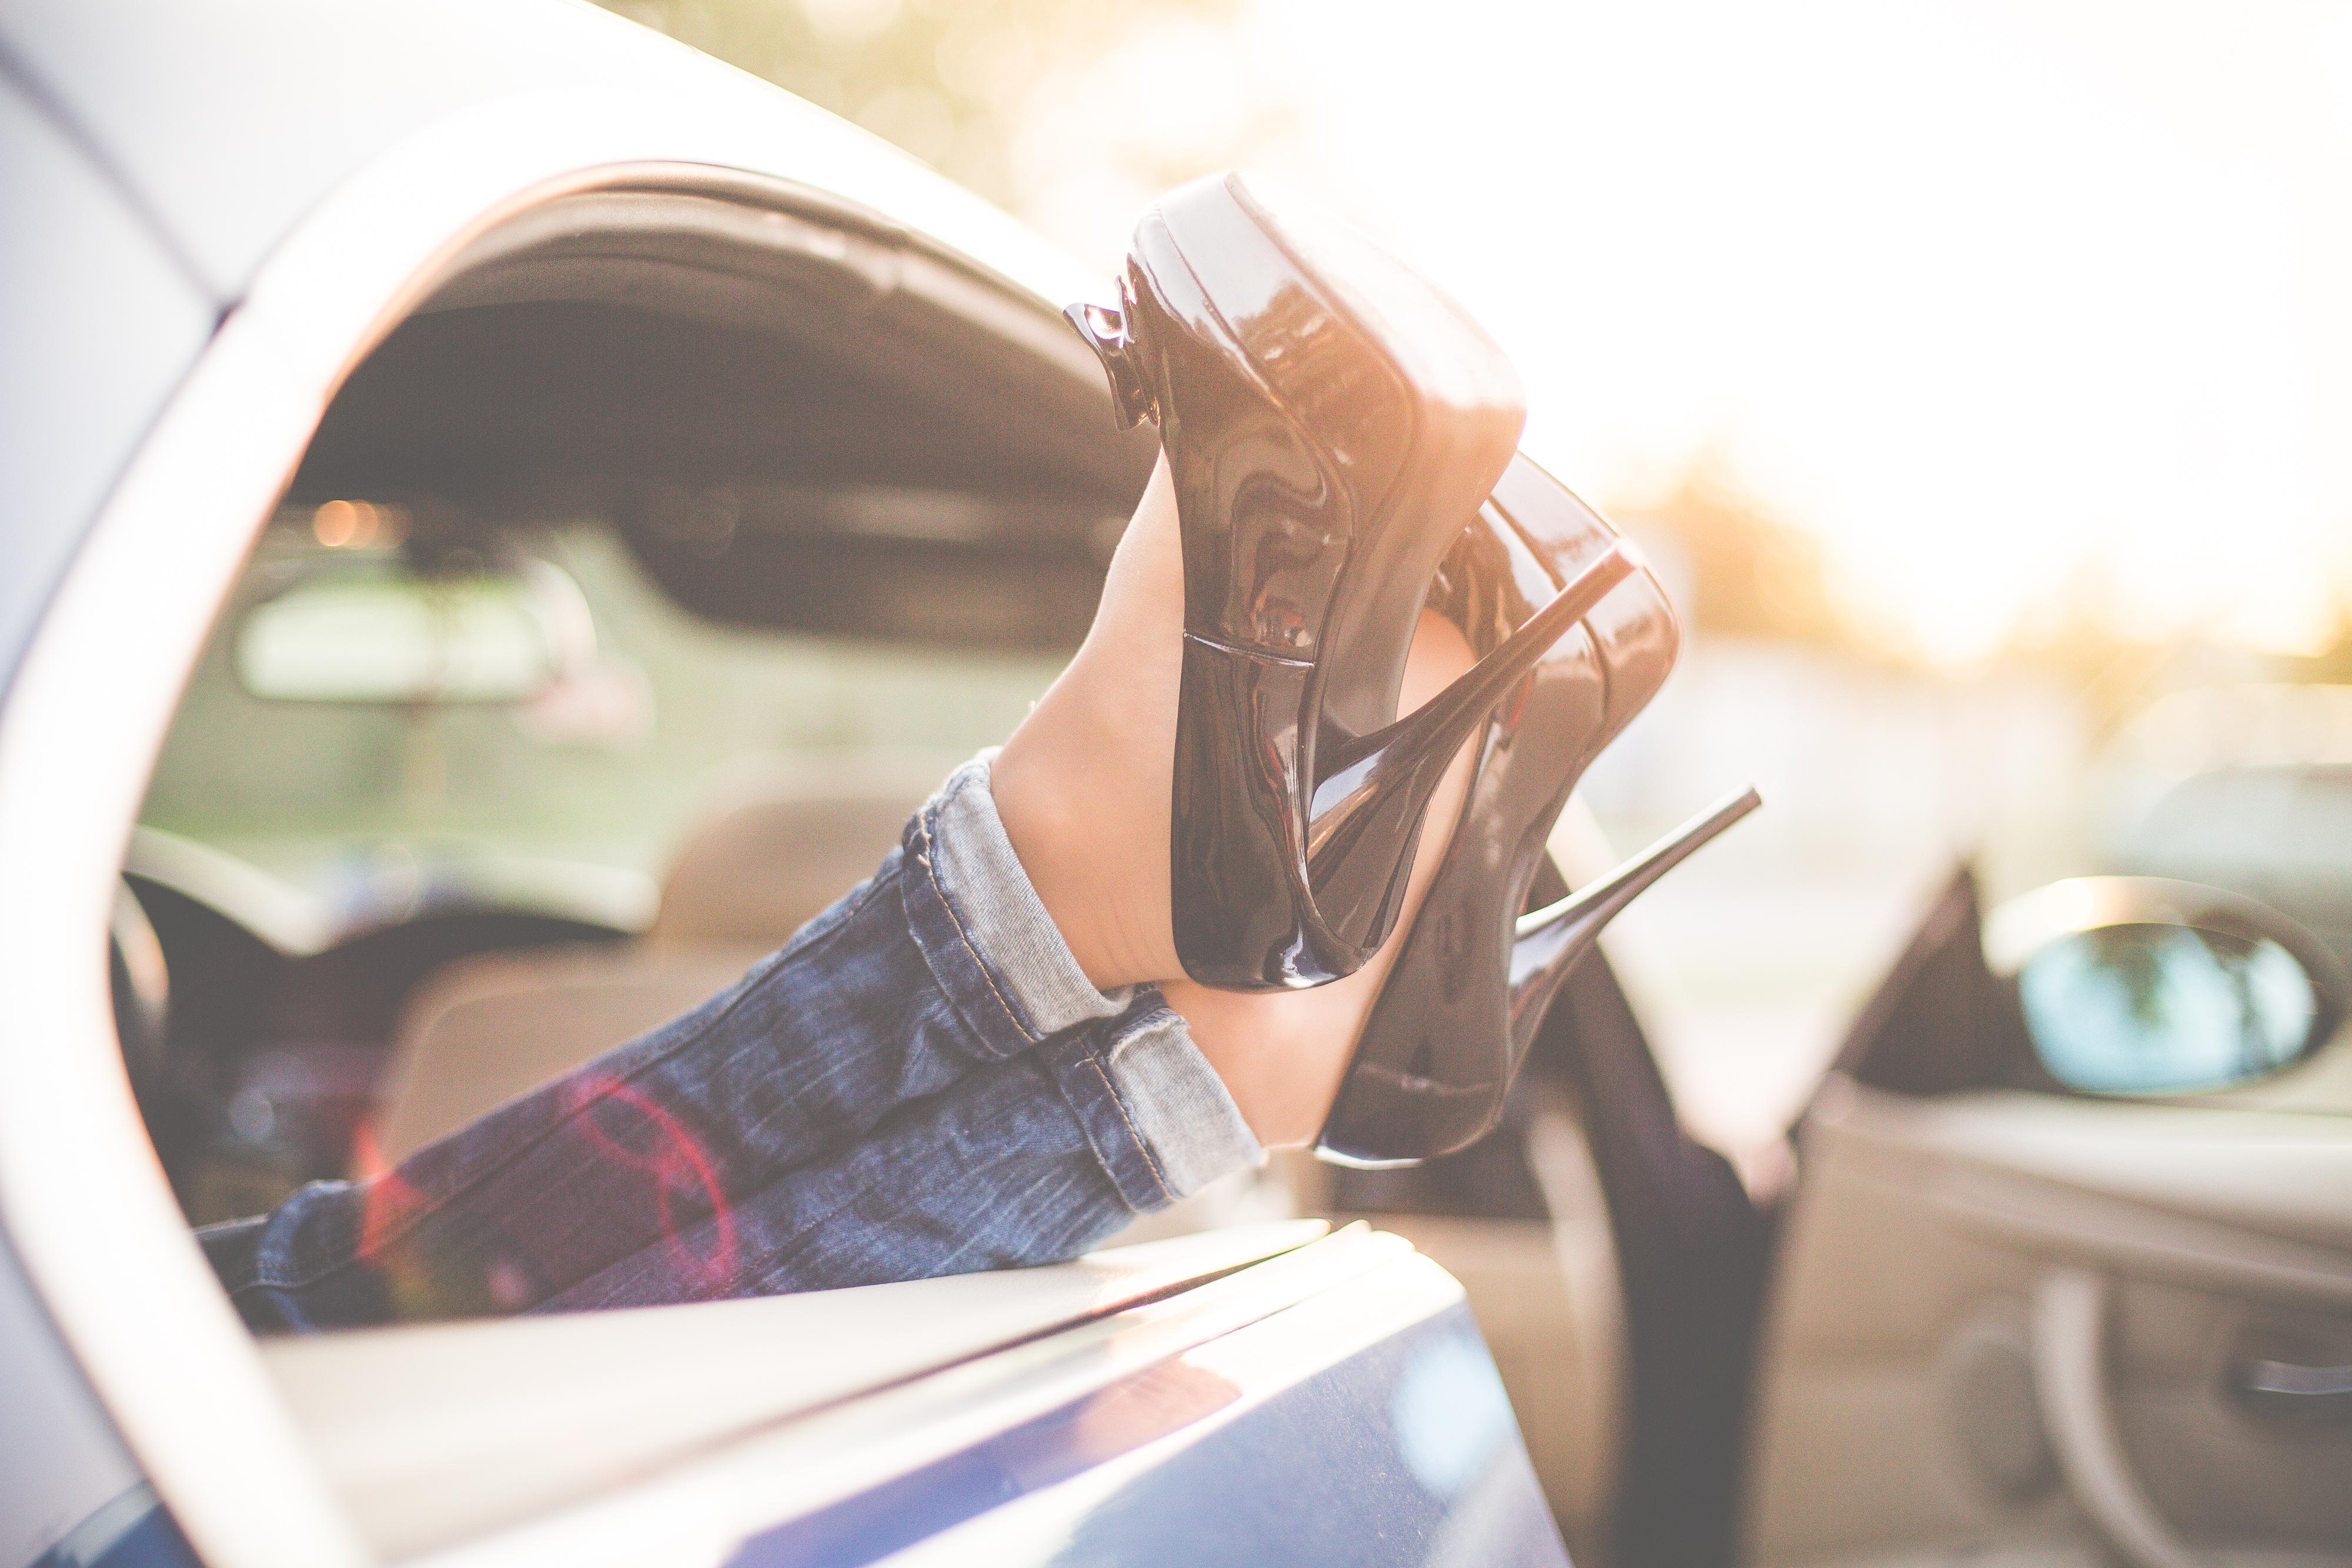 picjumbo.com_HNCK9042 shoes